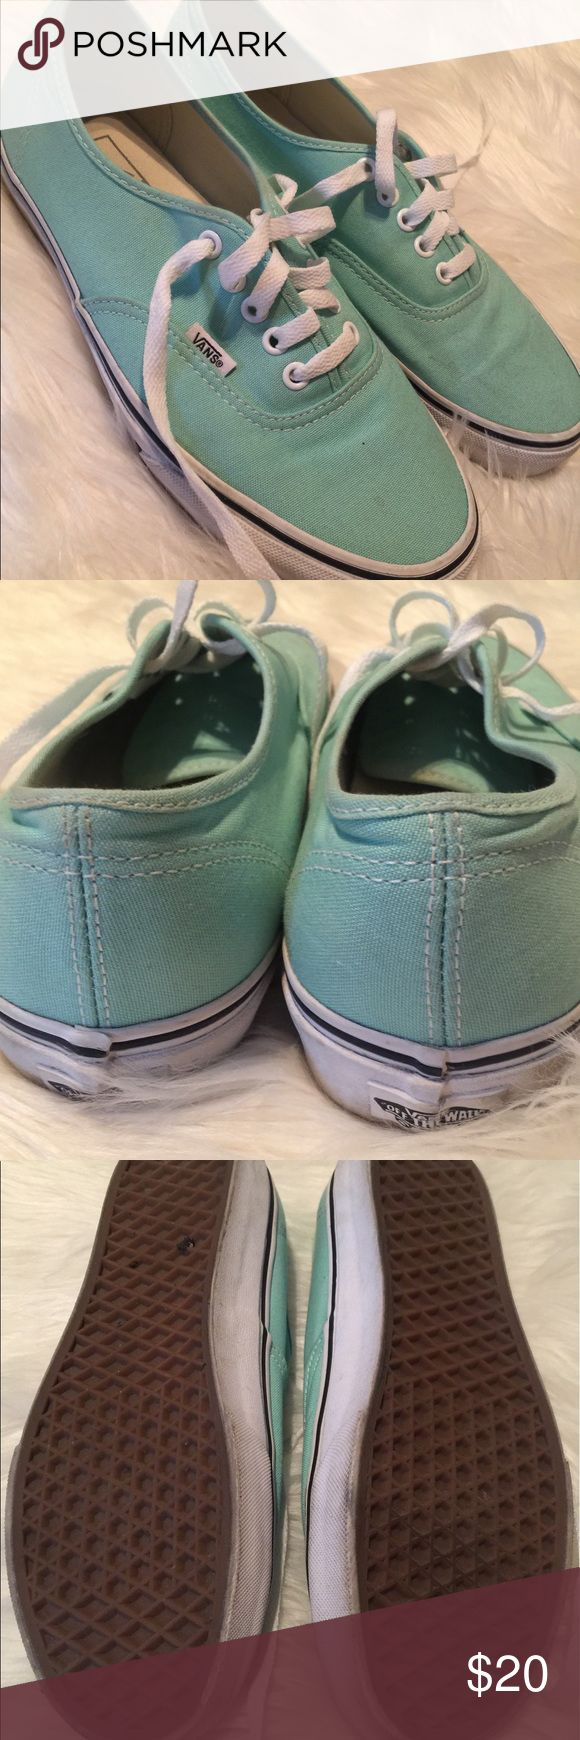 Mint green Vans Gently used mint green vans. Only worn twice. Moderate wear on soles. *MENS 8/WOMEN'S 9.5* Vans Shoes Sneakers